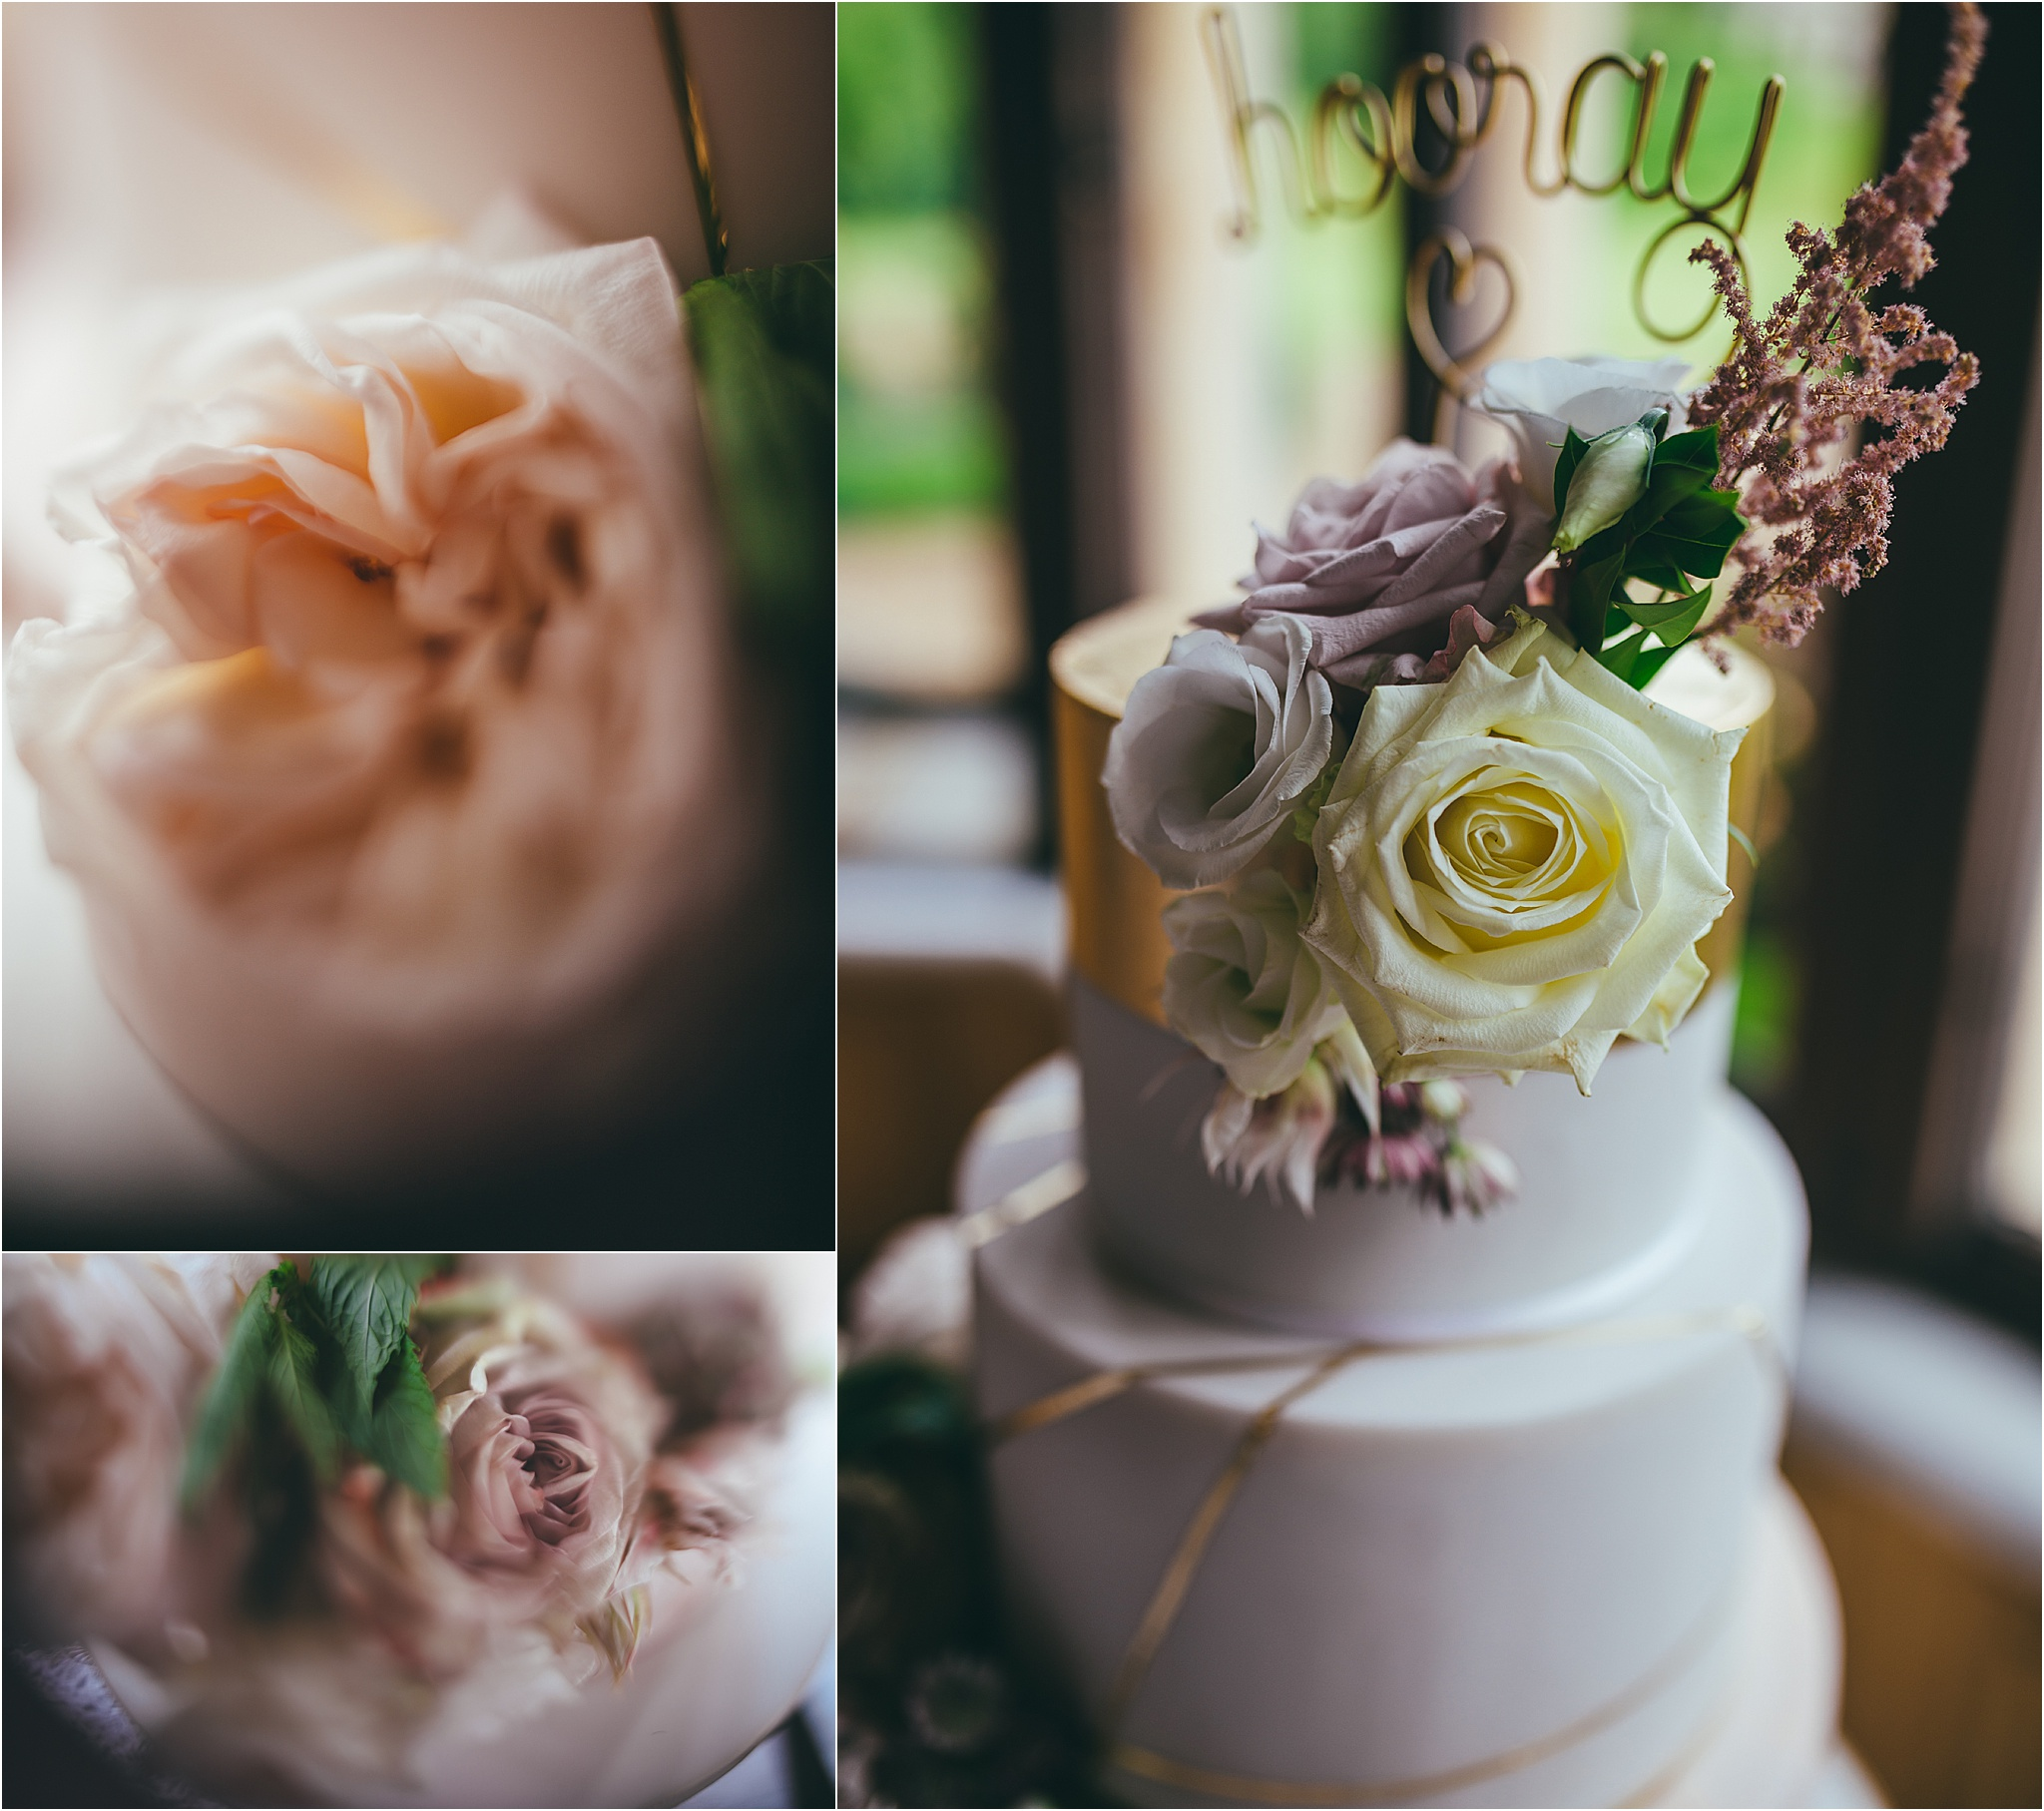 Wedding cake details at Harlaxton Manor